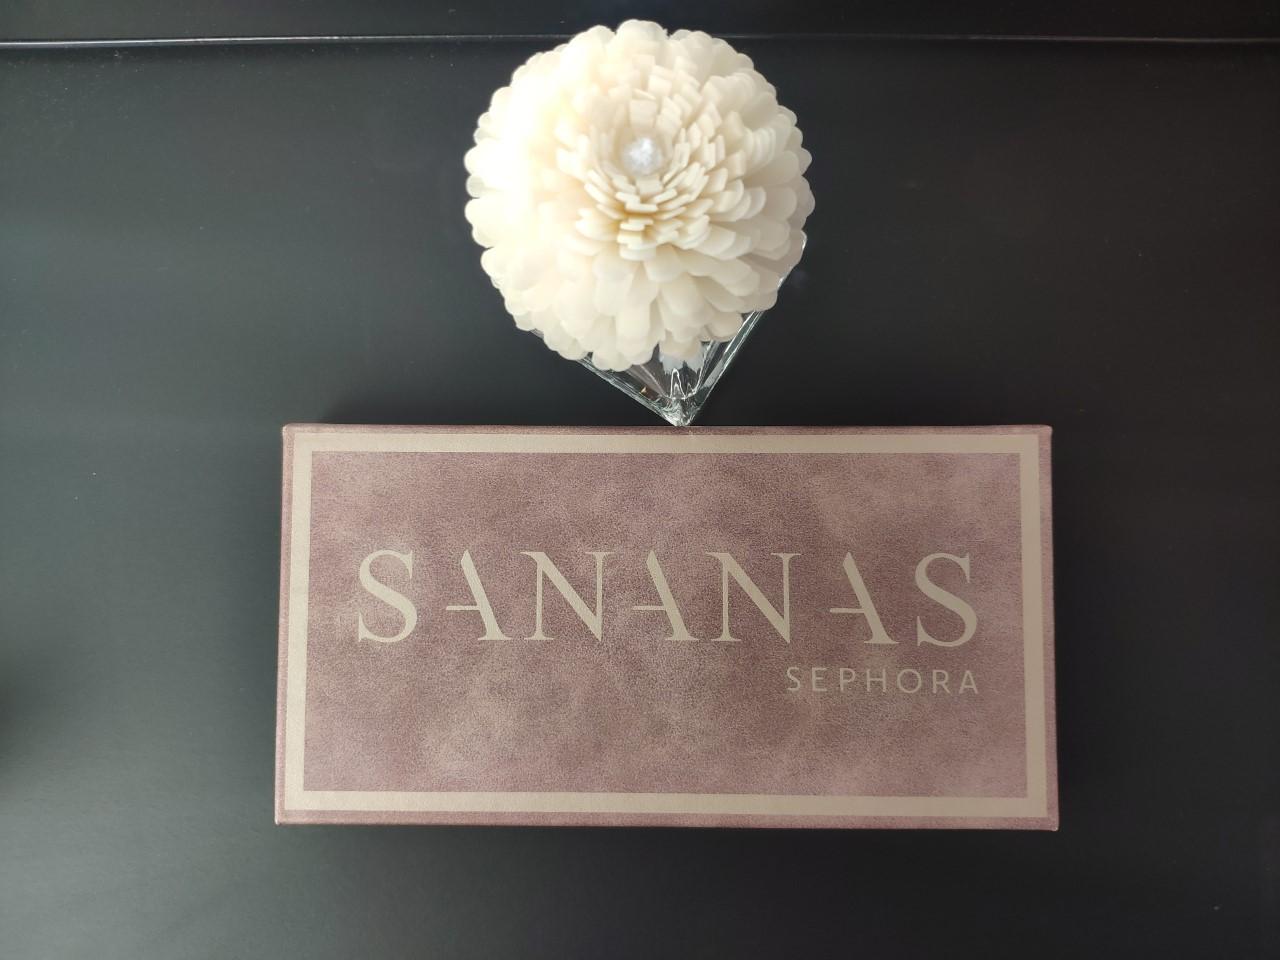 SANANAS x SEPHORA maquillage avis test produit